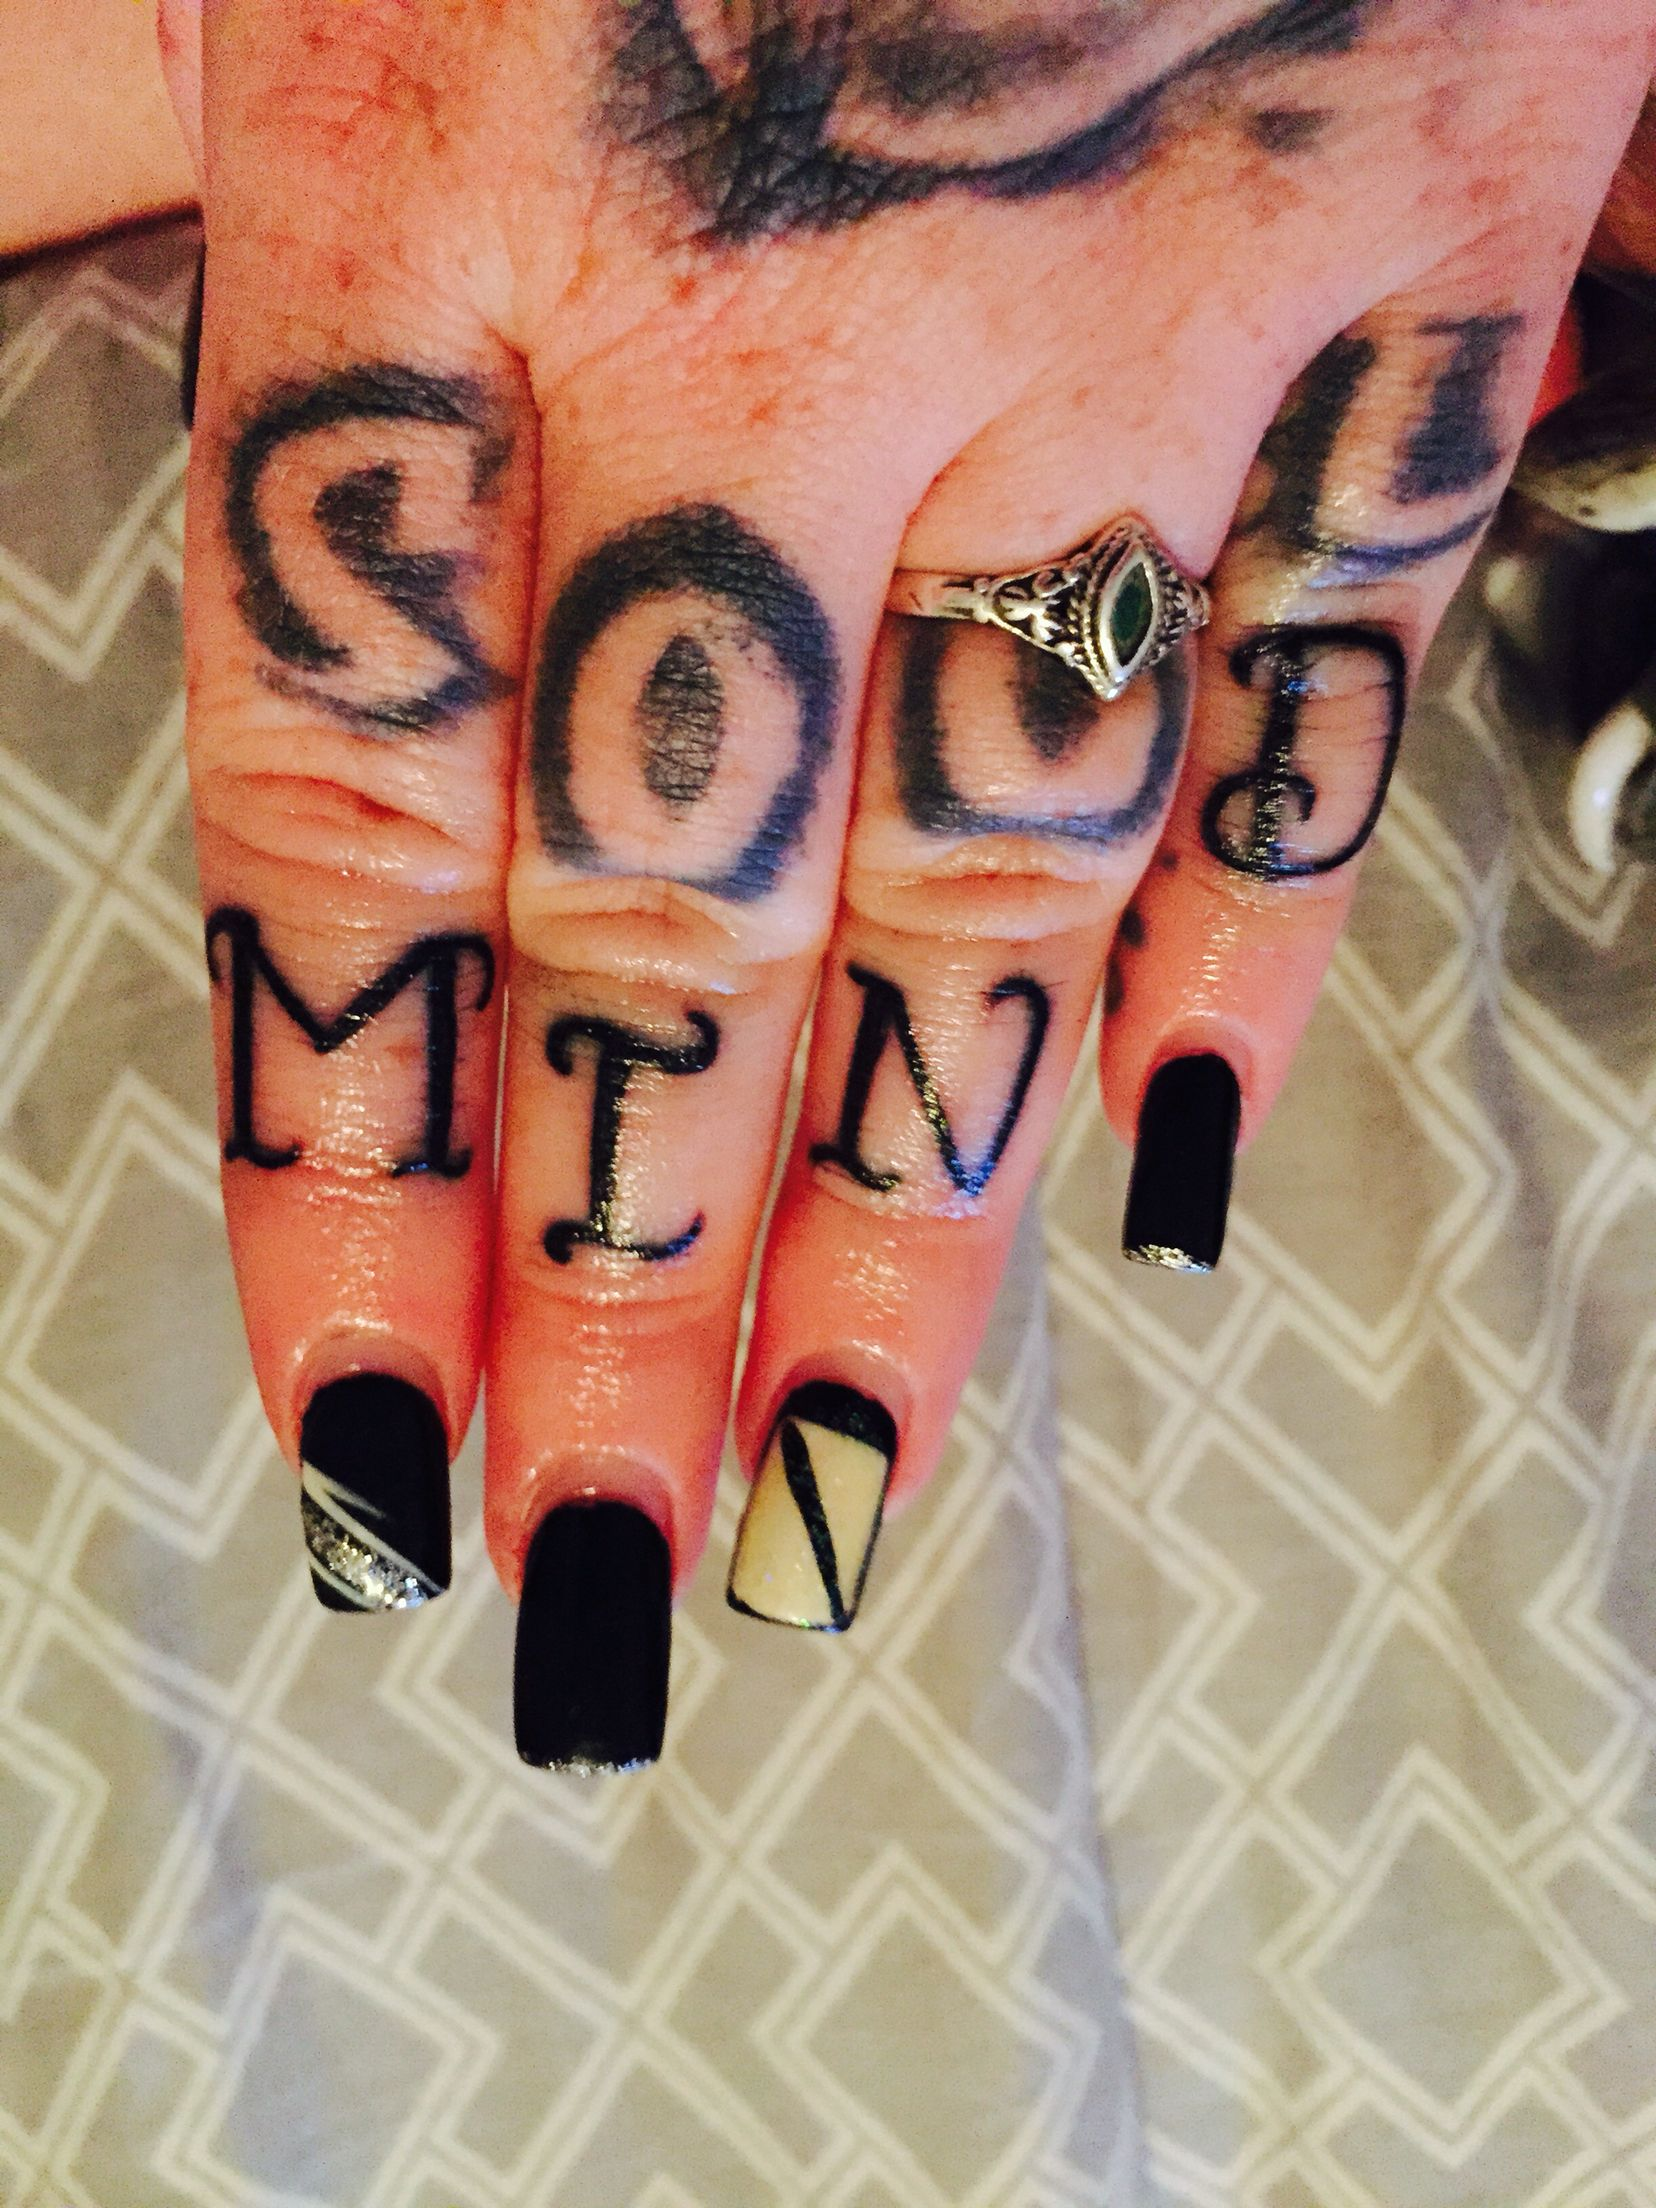 Girl knuckle tattoo ideas knuckles tattoos  my tattoos  pinterest  knuckle tattoos and tattoo